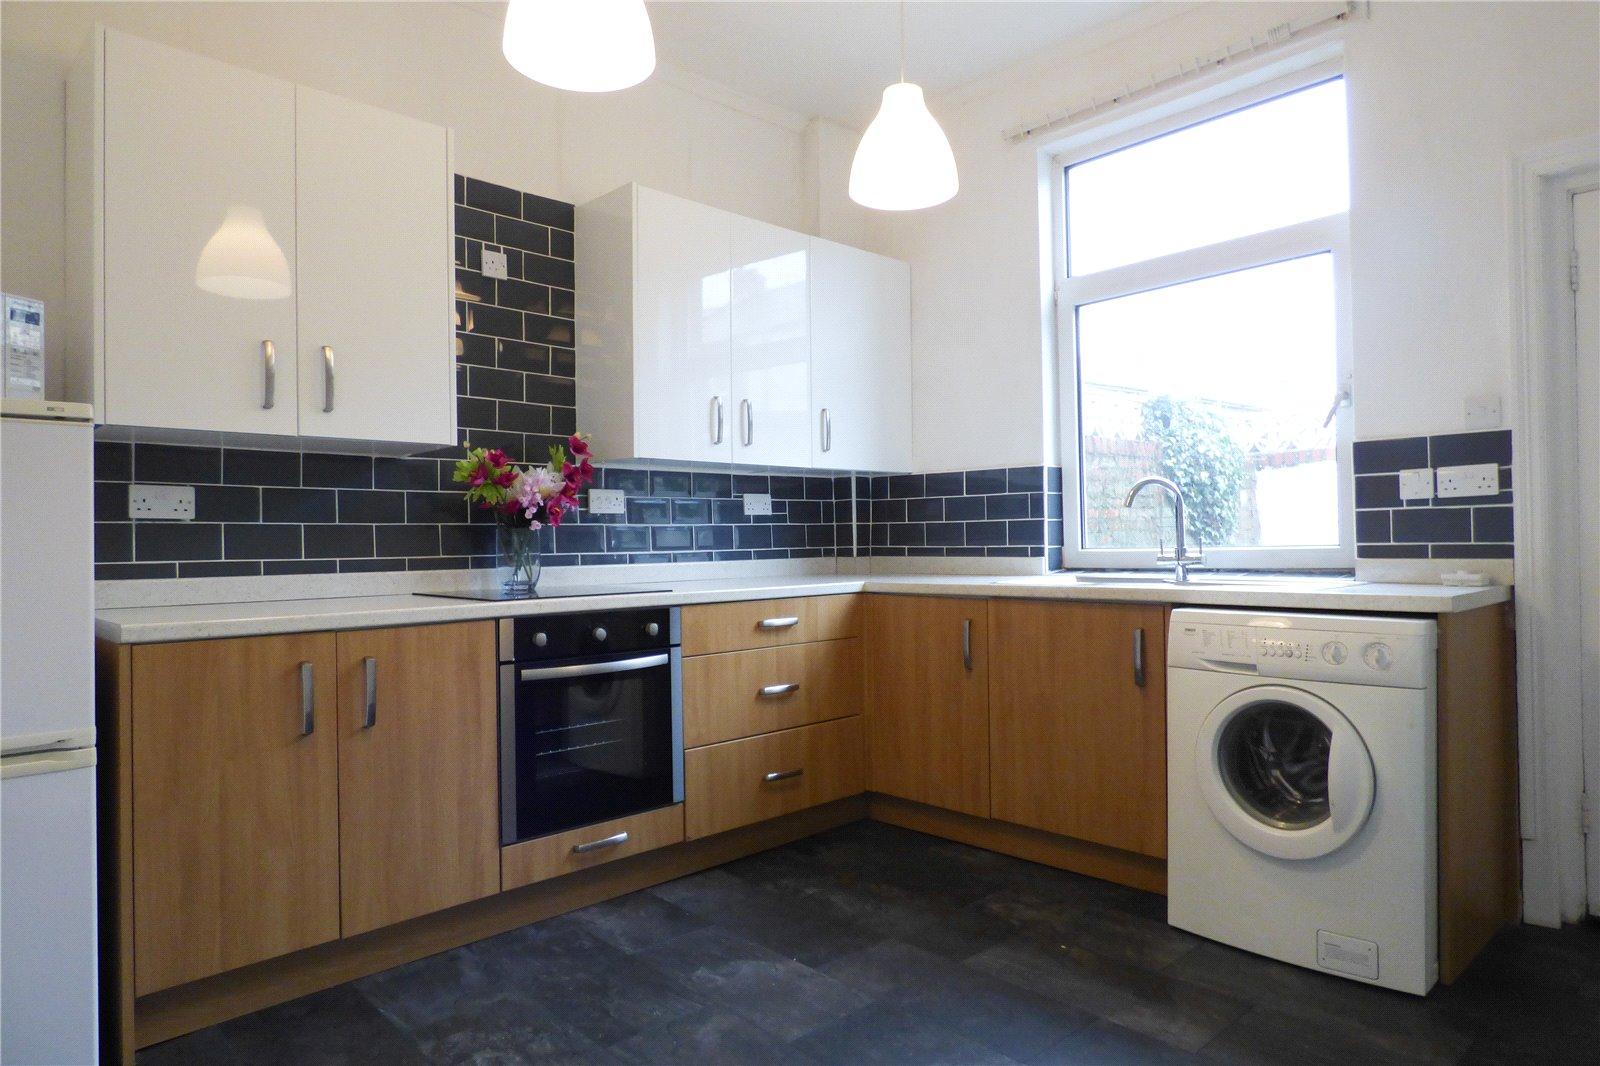 2 Bedrooms End Of Terrace House for sale in Herries Street, Ashton-under-Lyne, Greater Manchester, OL6